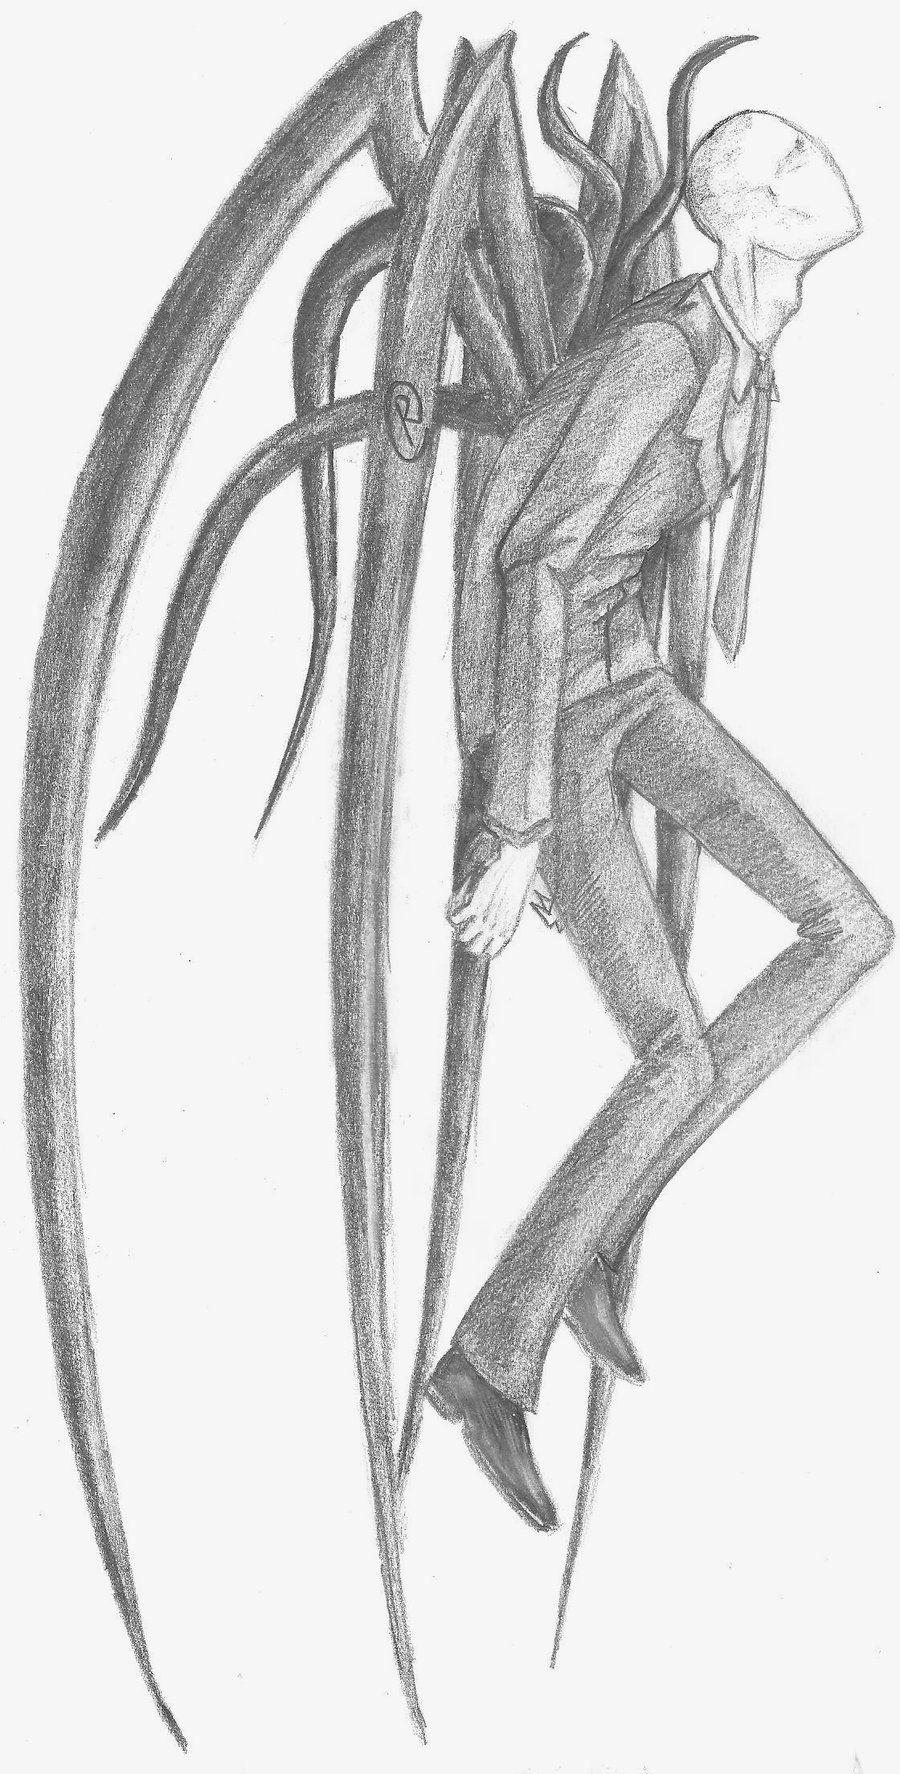 Slender Man By Rakkasah On Deviantart Dibujos De Slenderman Creepypastas Dibujos